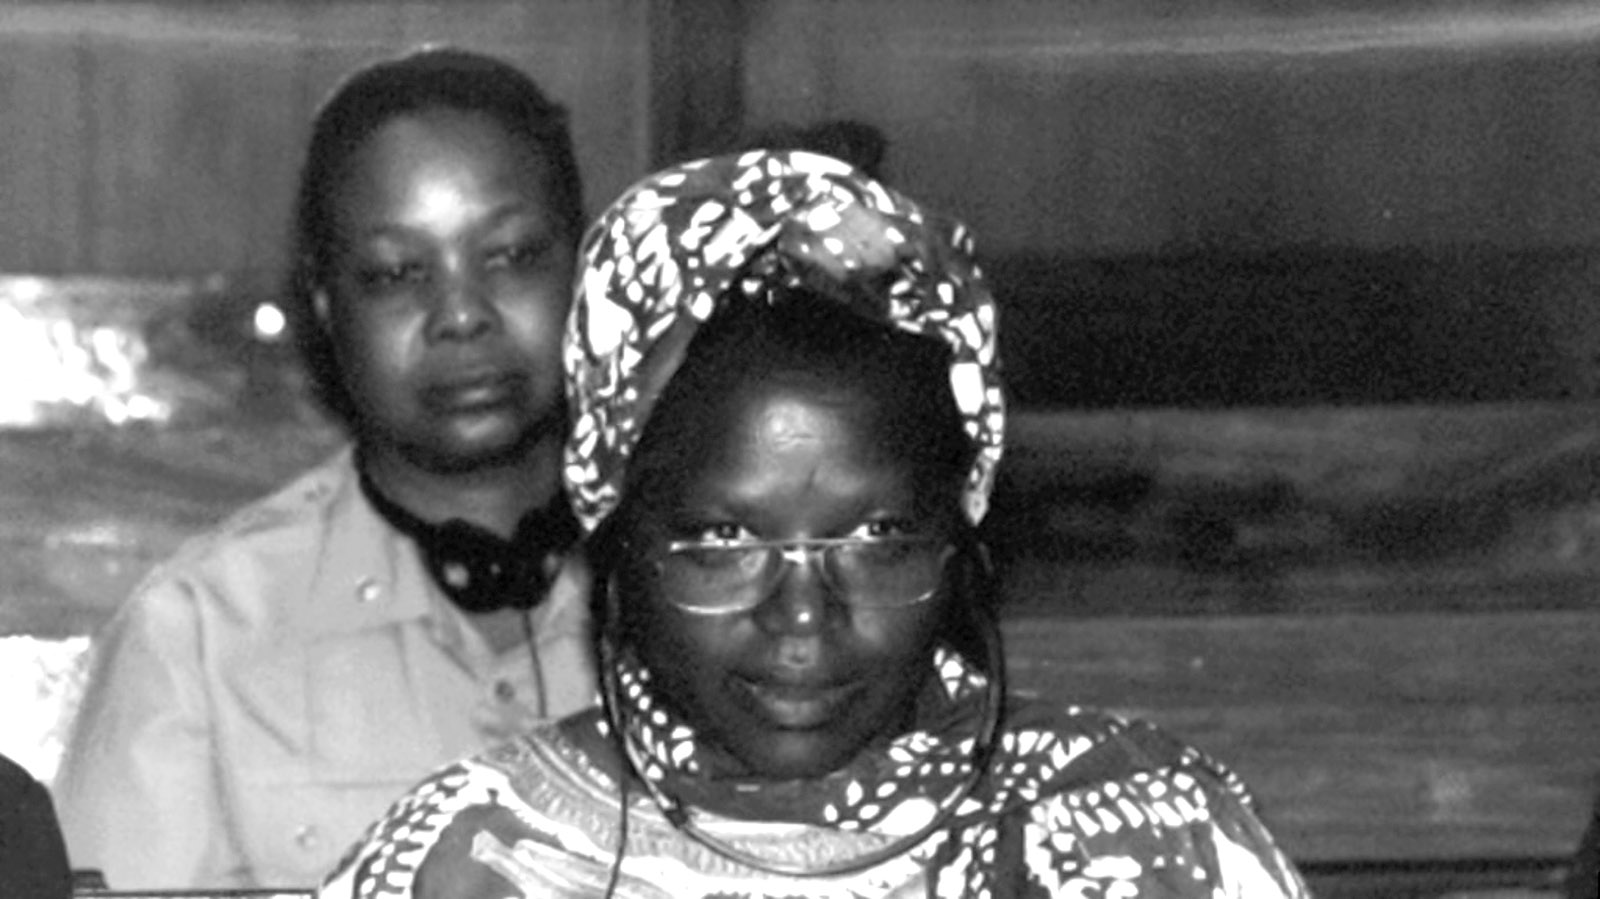 Pauline Nyiramasuhuko at her trial for war crimes